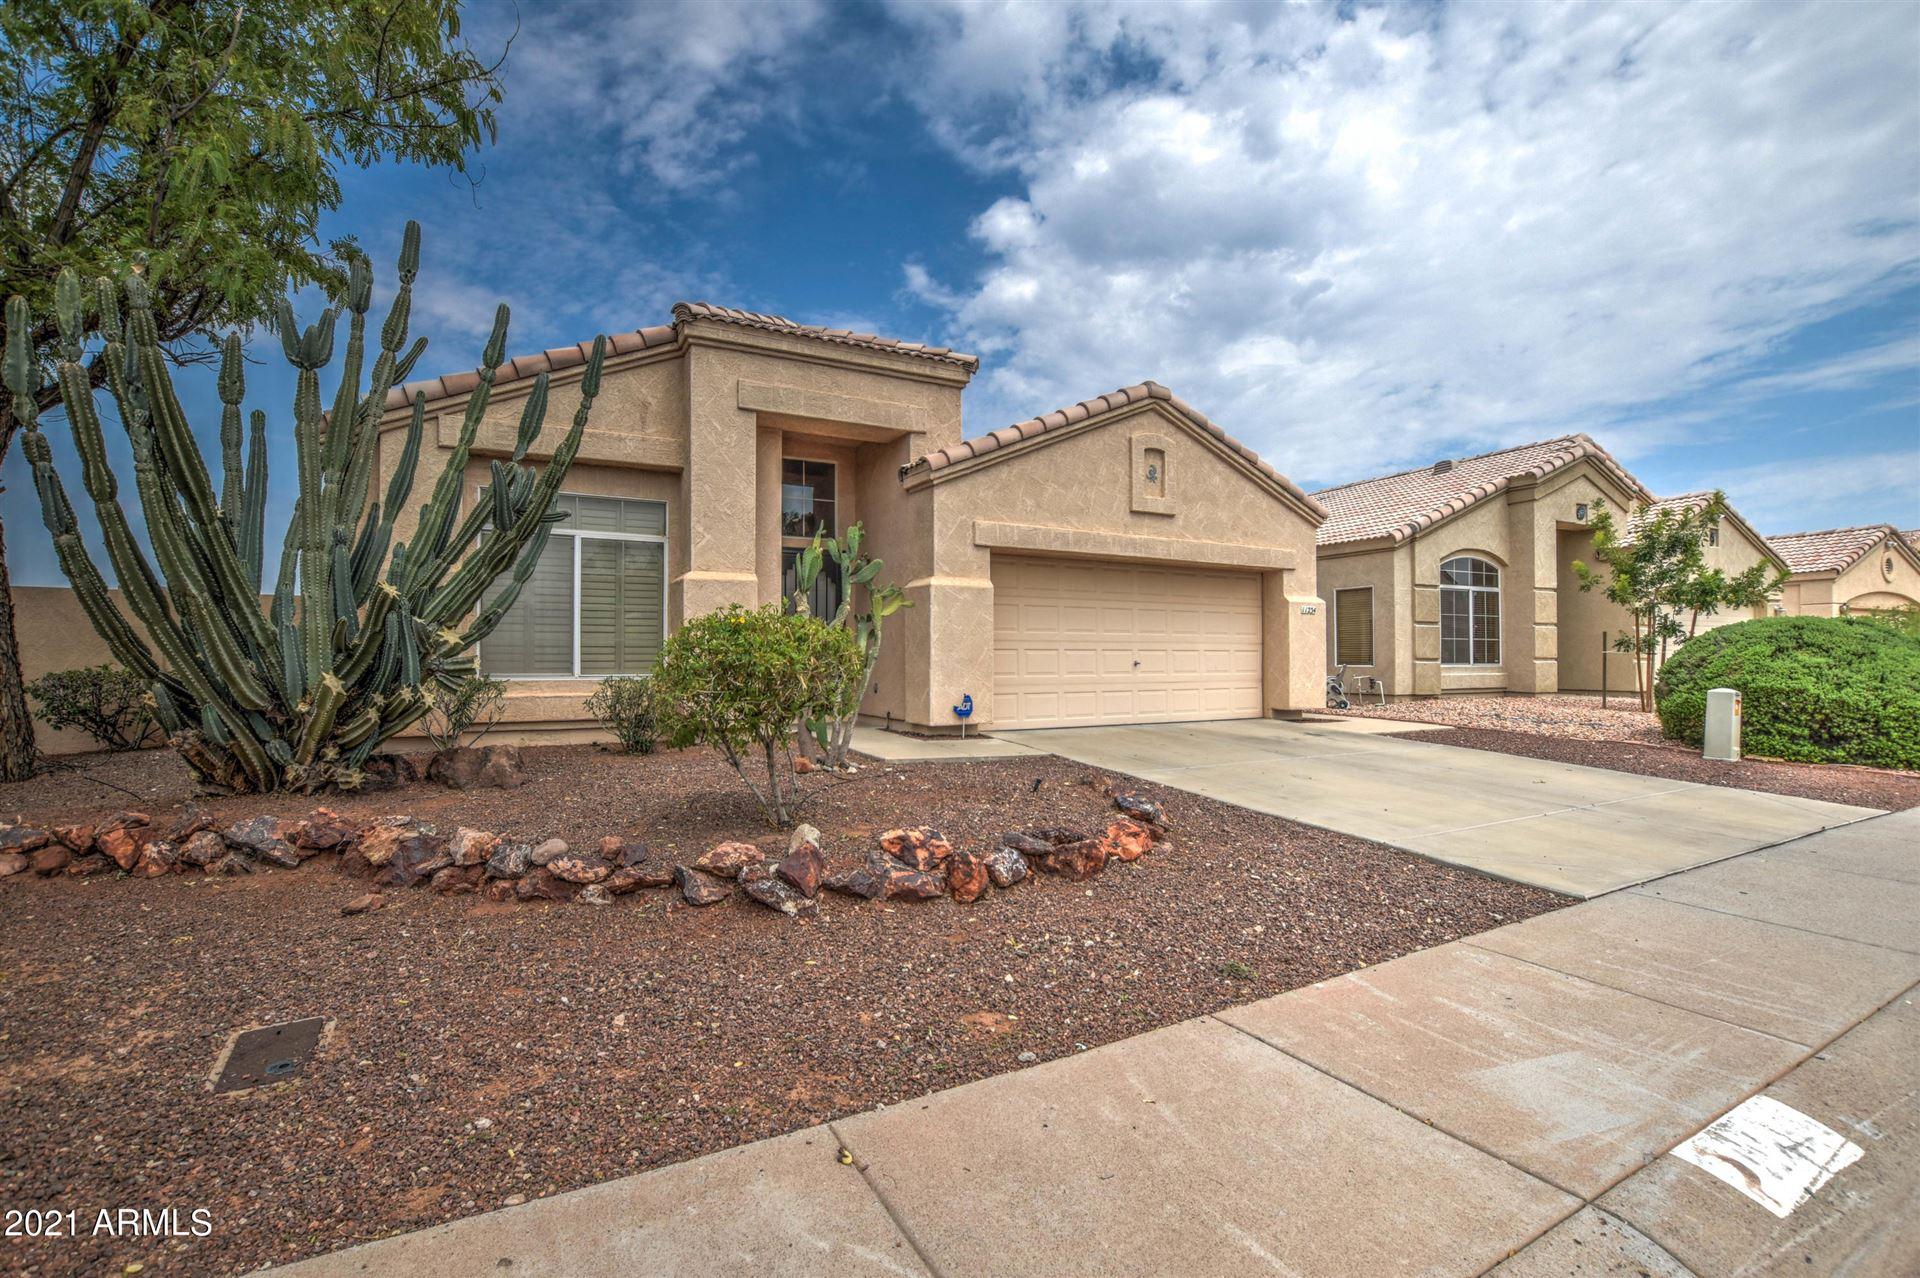 Photo of 11234 W AMELIA Avenue, Avondale, AZ 85392 (MLS # 6268511)